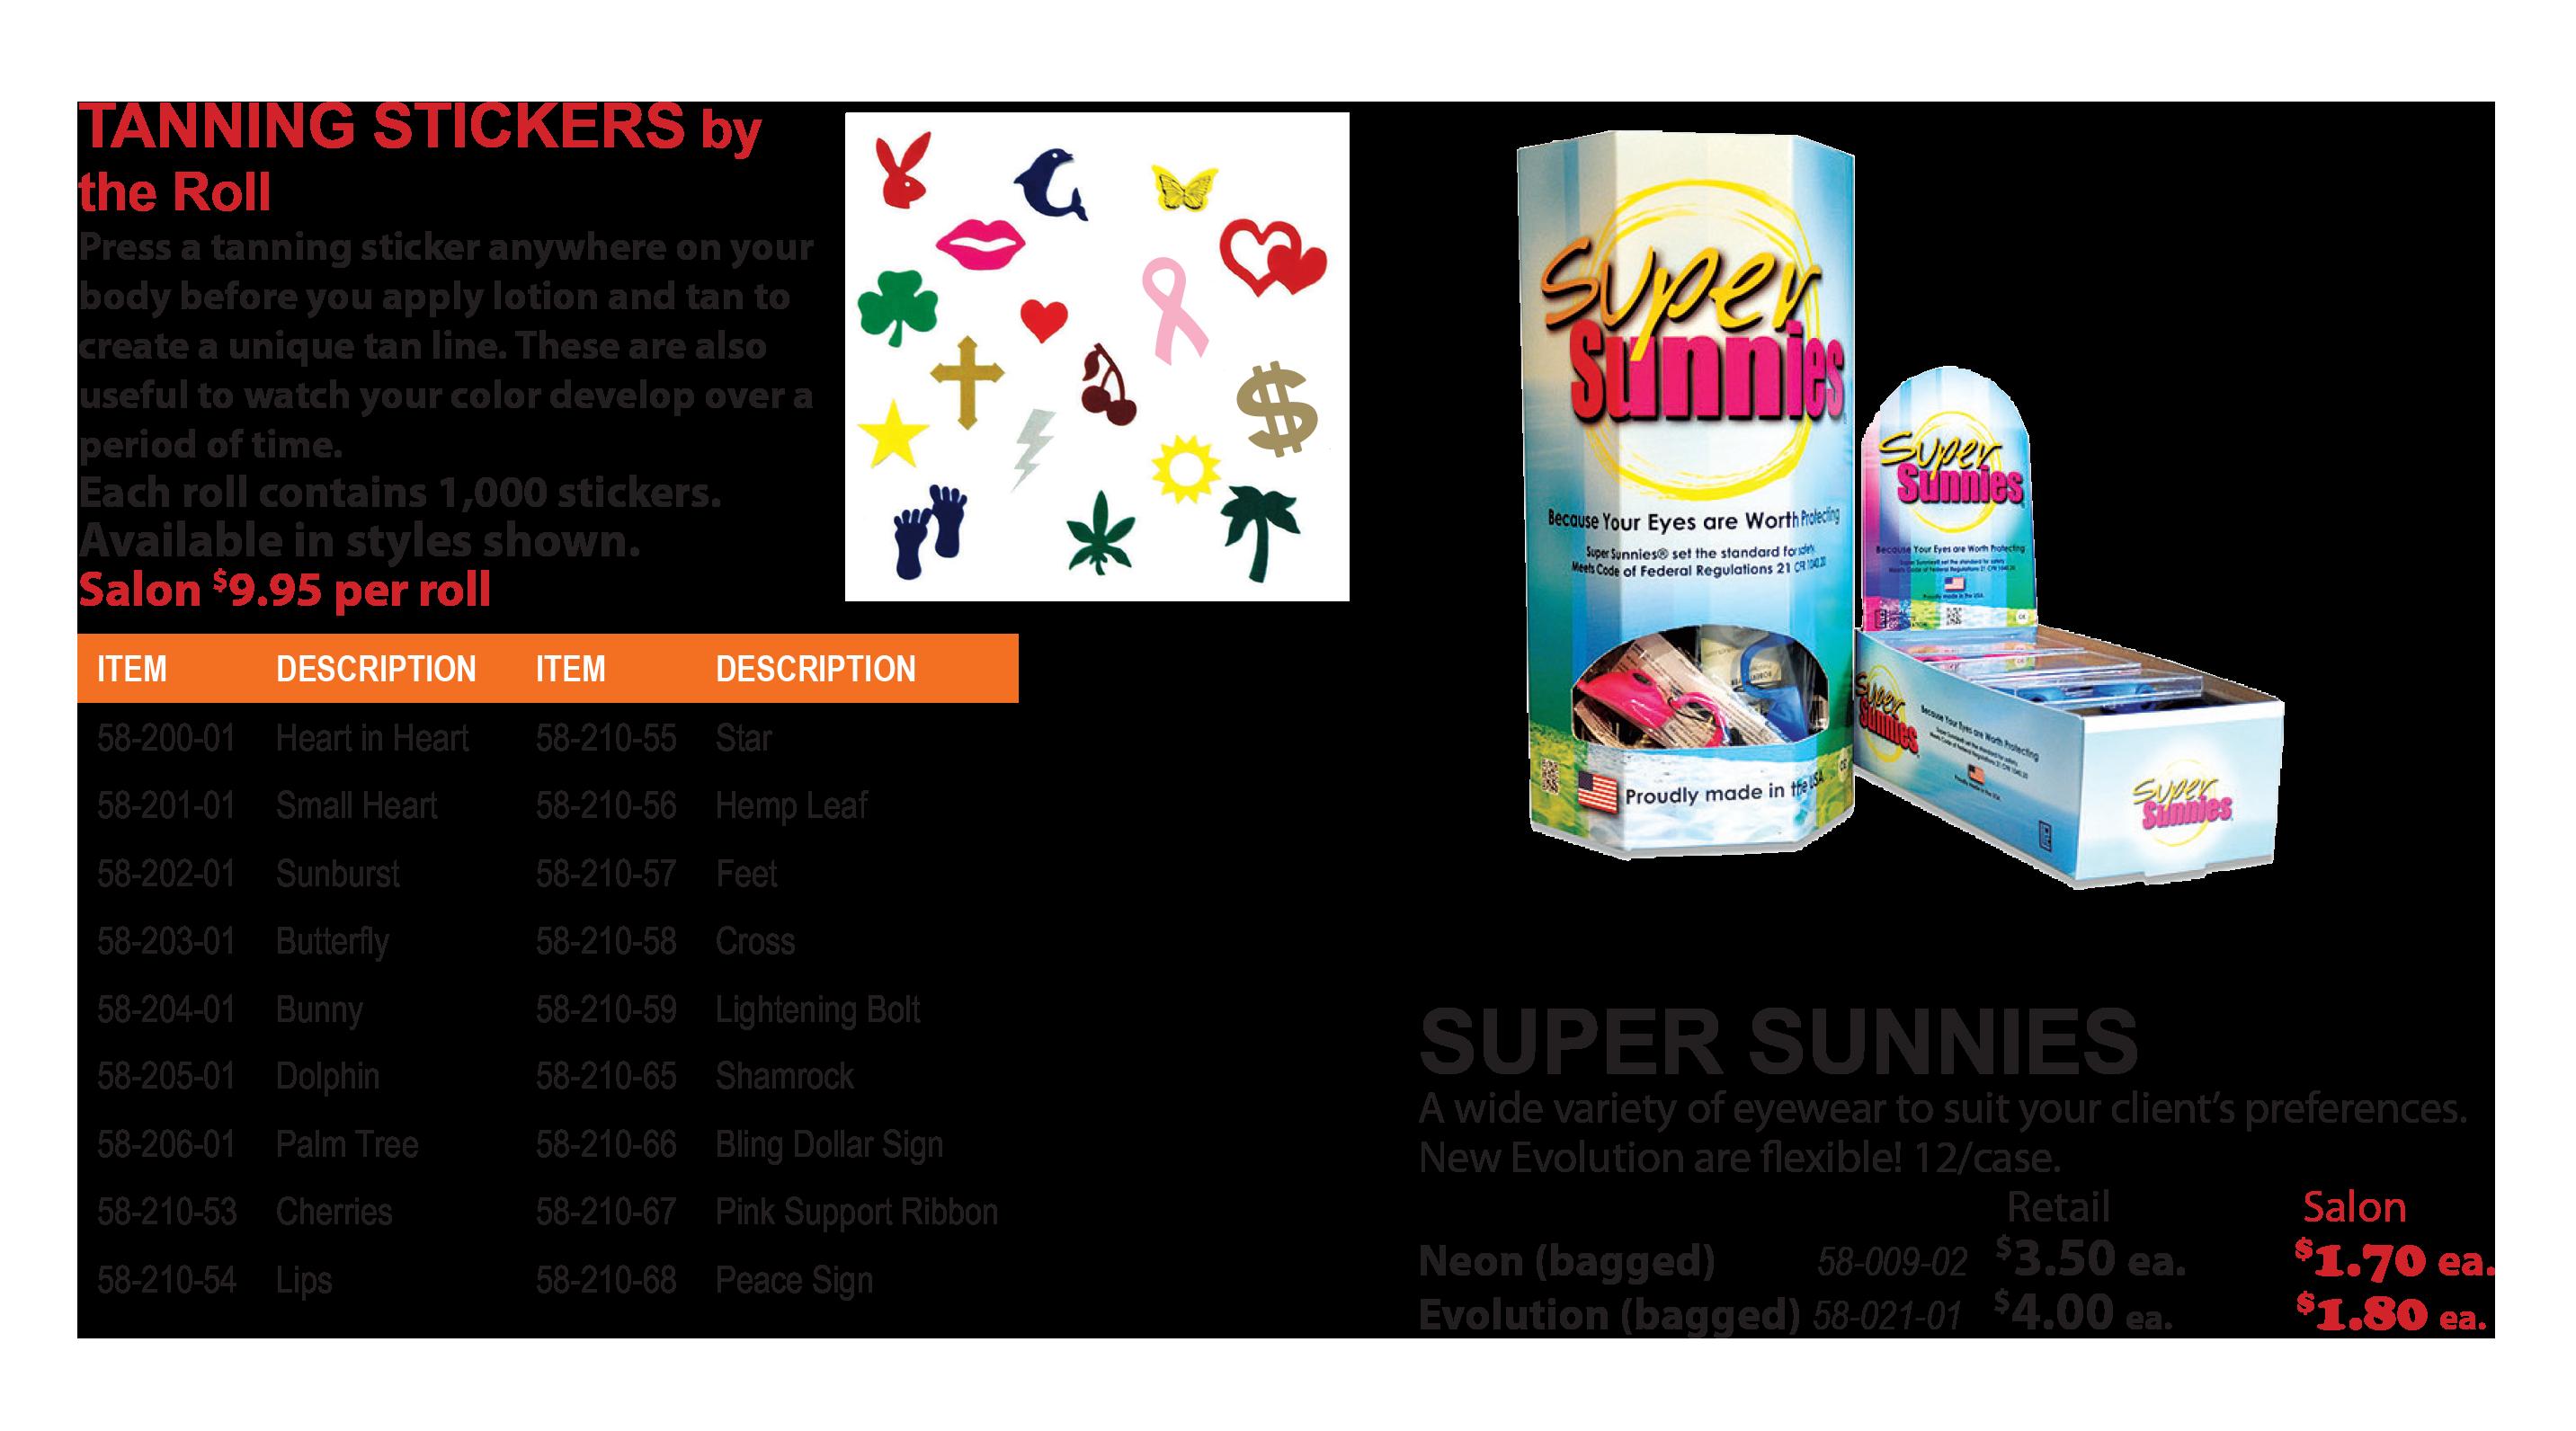 tanning stickers and super sunnies eyewear